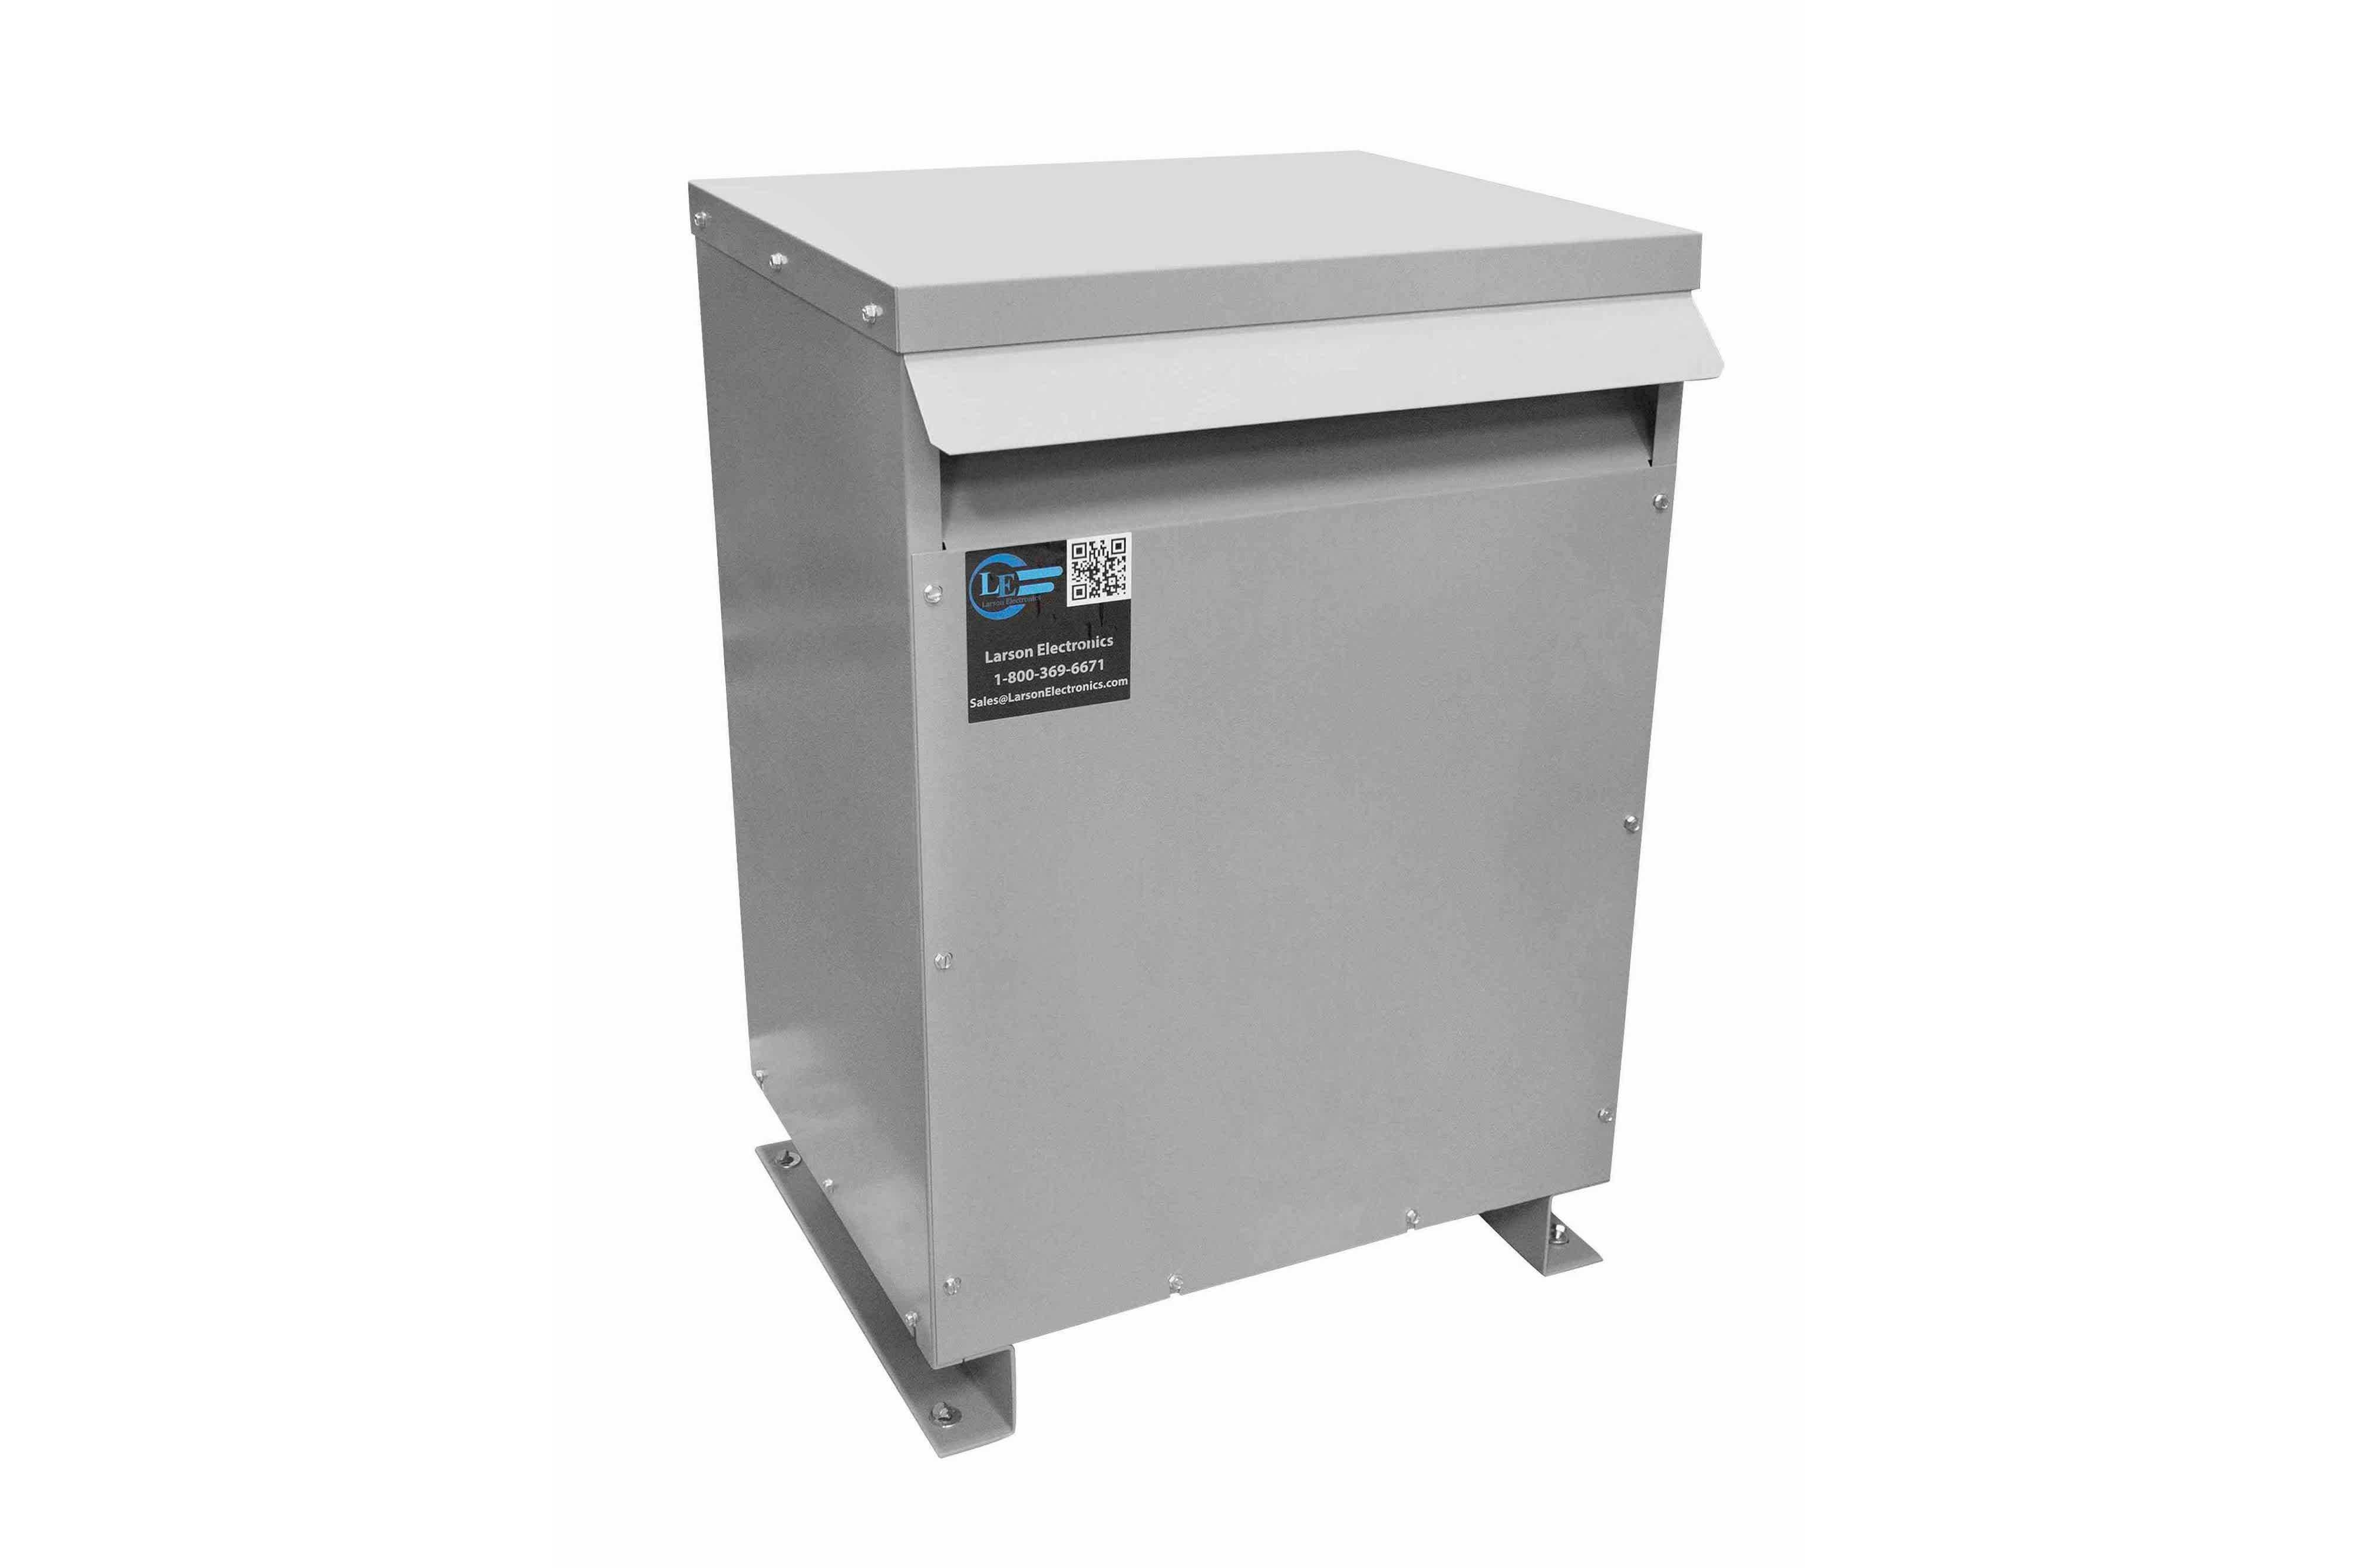 115 kVA 3PH Isolation Transformer, 575V Wye Primary, 208V Delta Secondary, N3R, Ventilated, 60 Hz